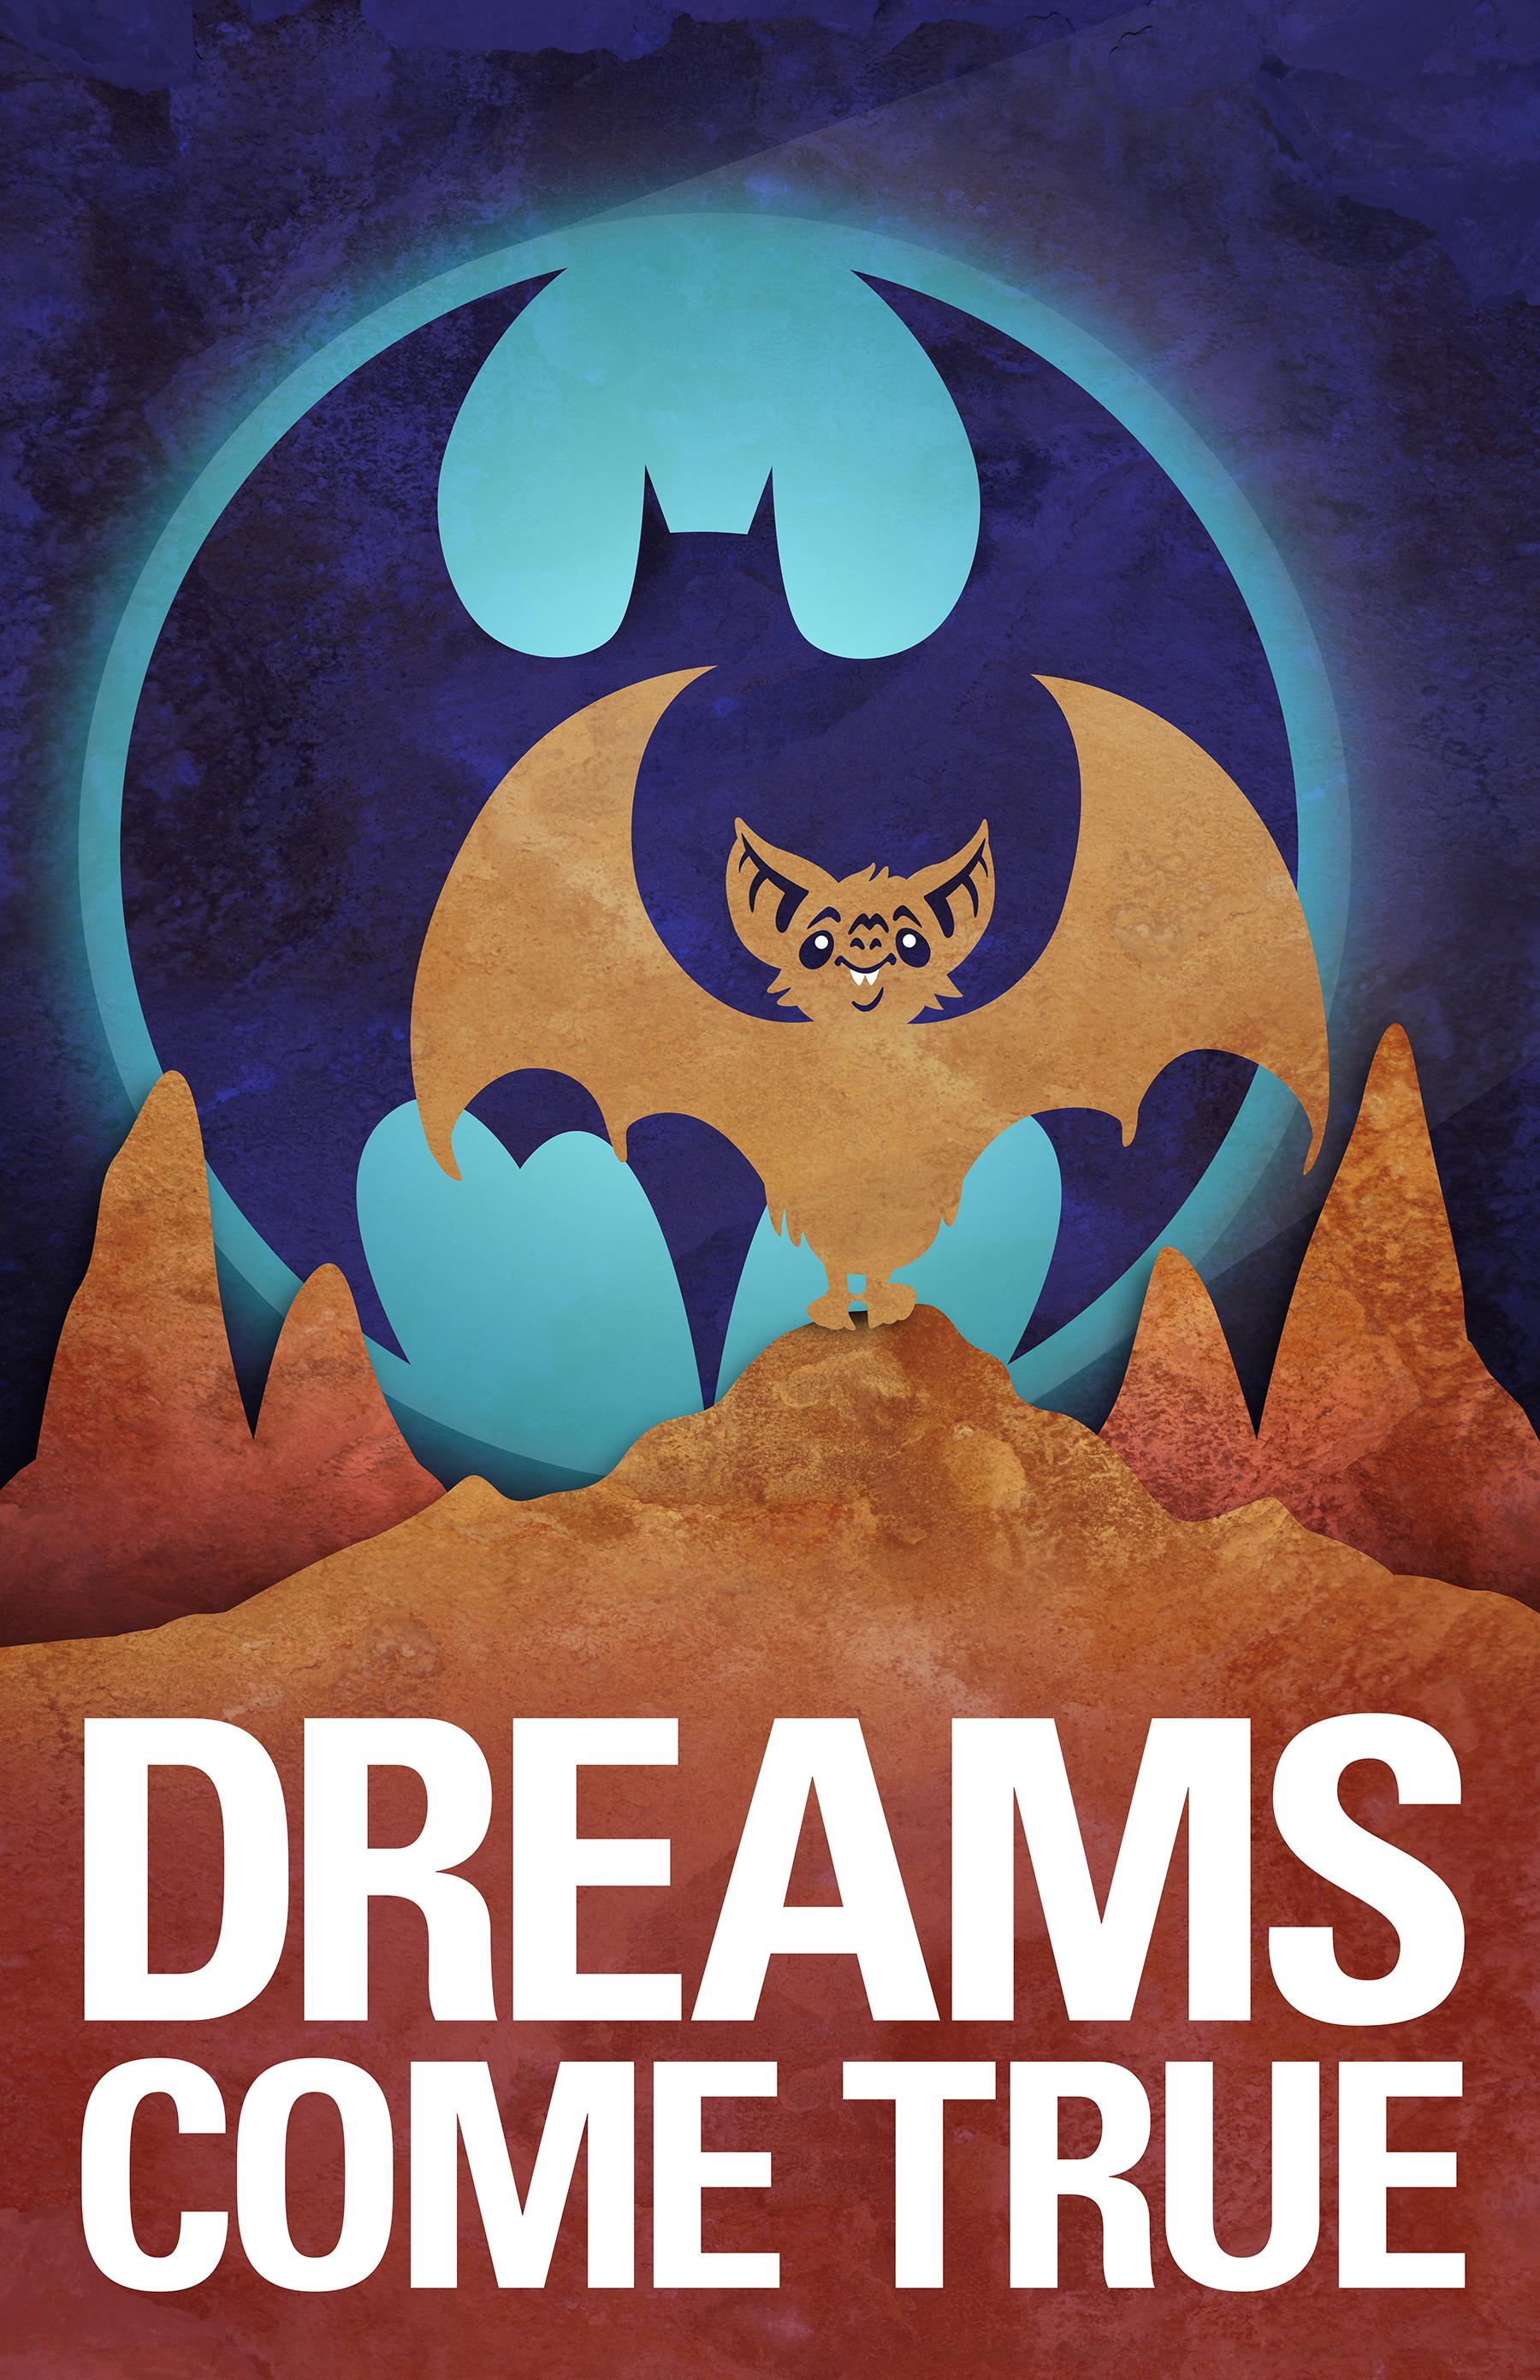 DreamsComeTrue_Bat.jpg